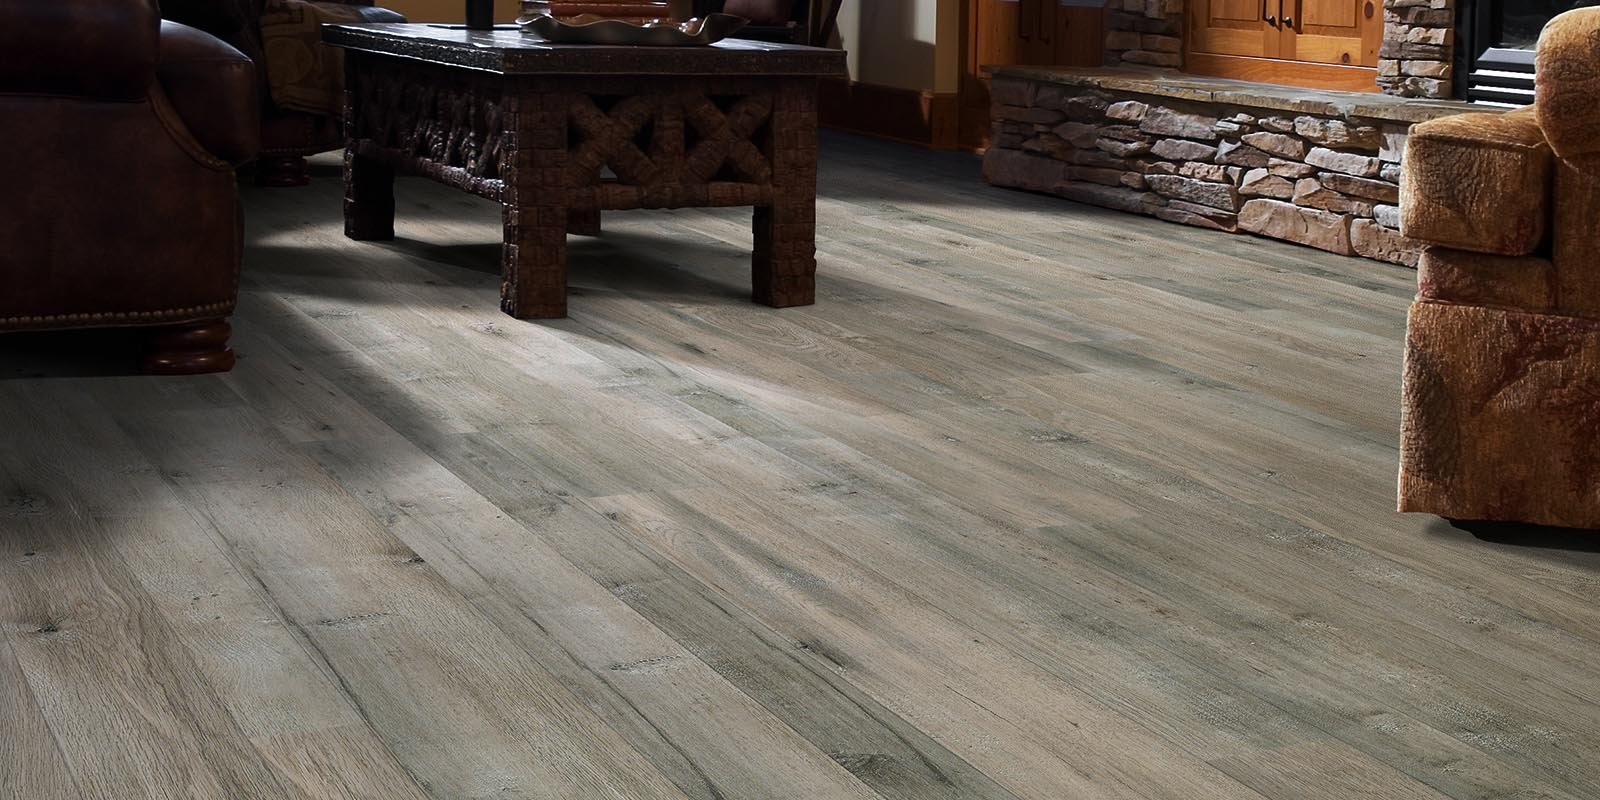 Laminate Flooring Care and Maintenance